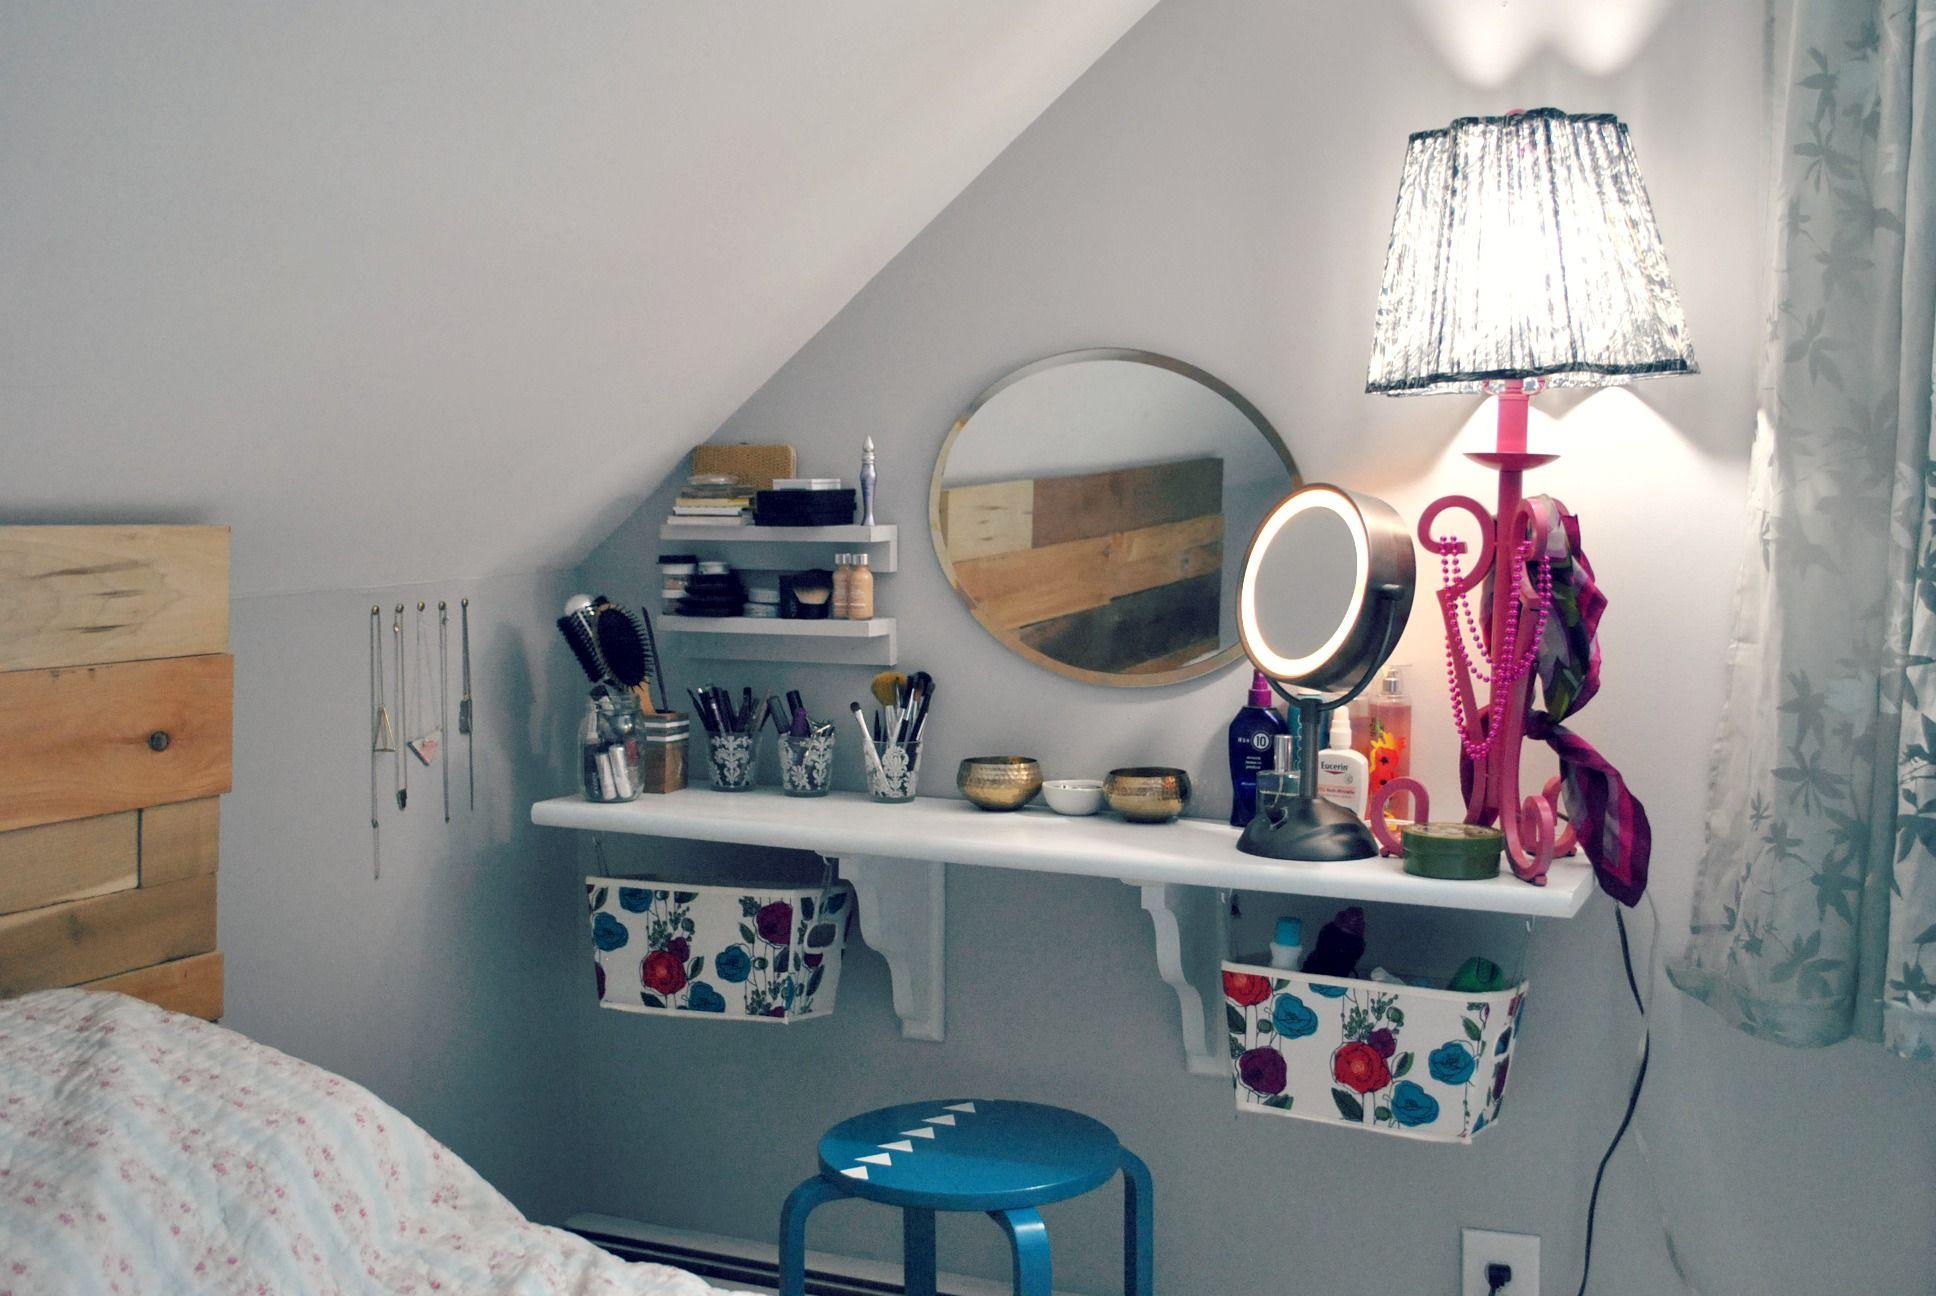 A Tray For Jewelry Room Diy Bedroom Diy Room Decor